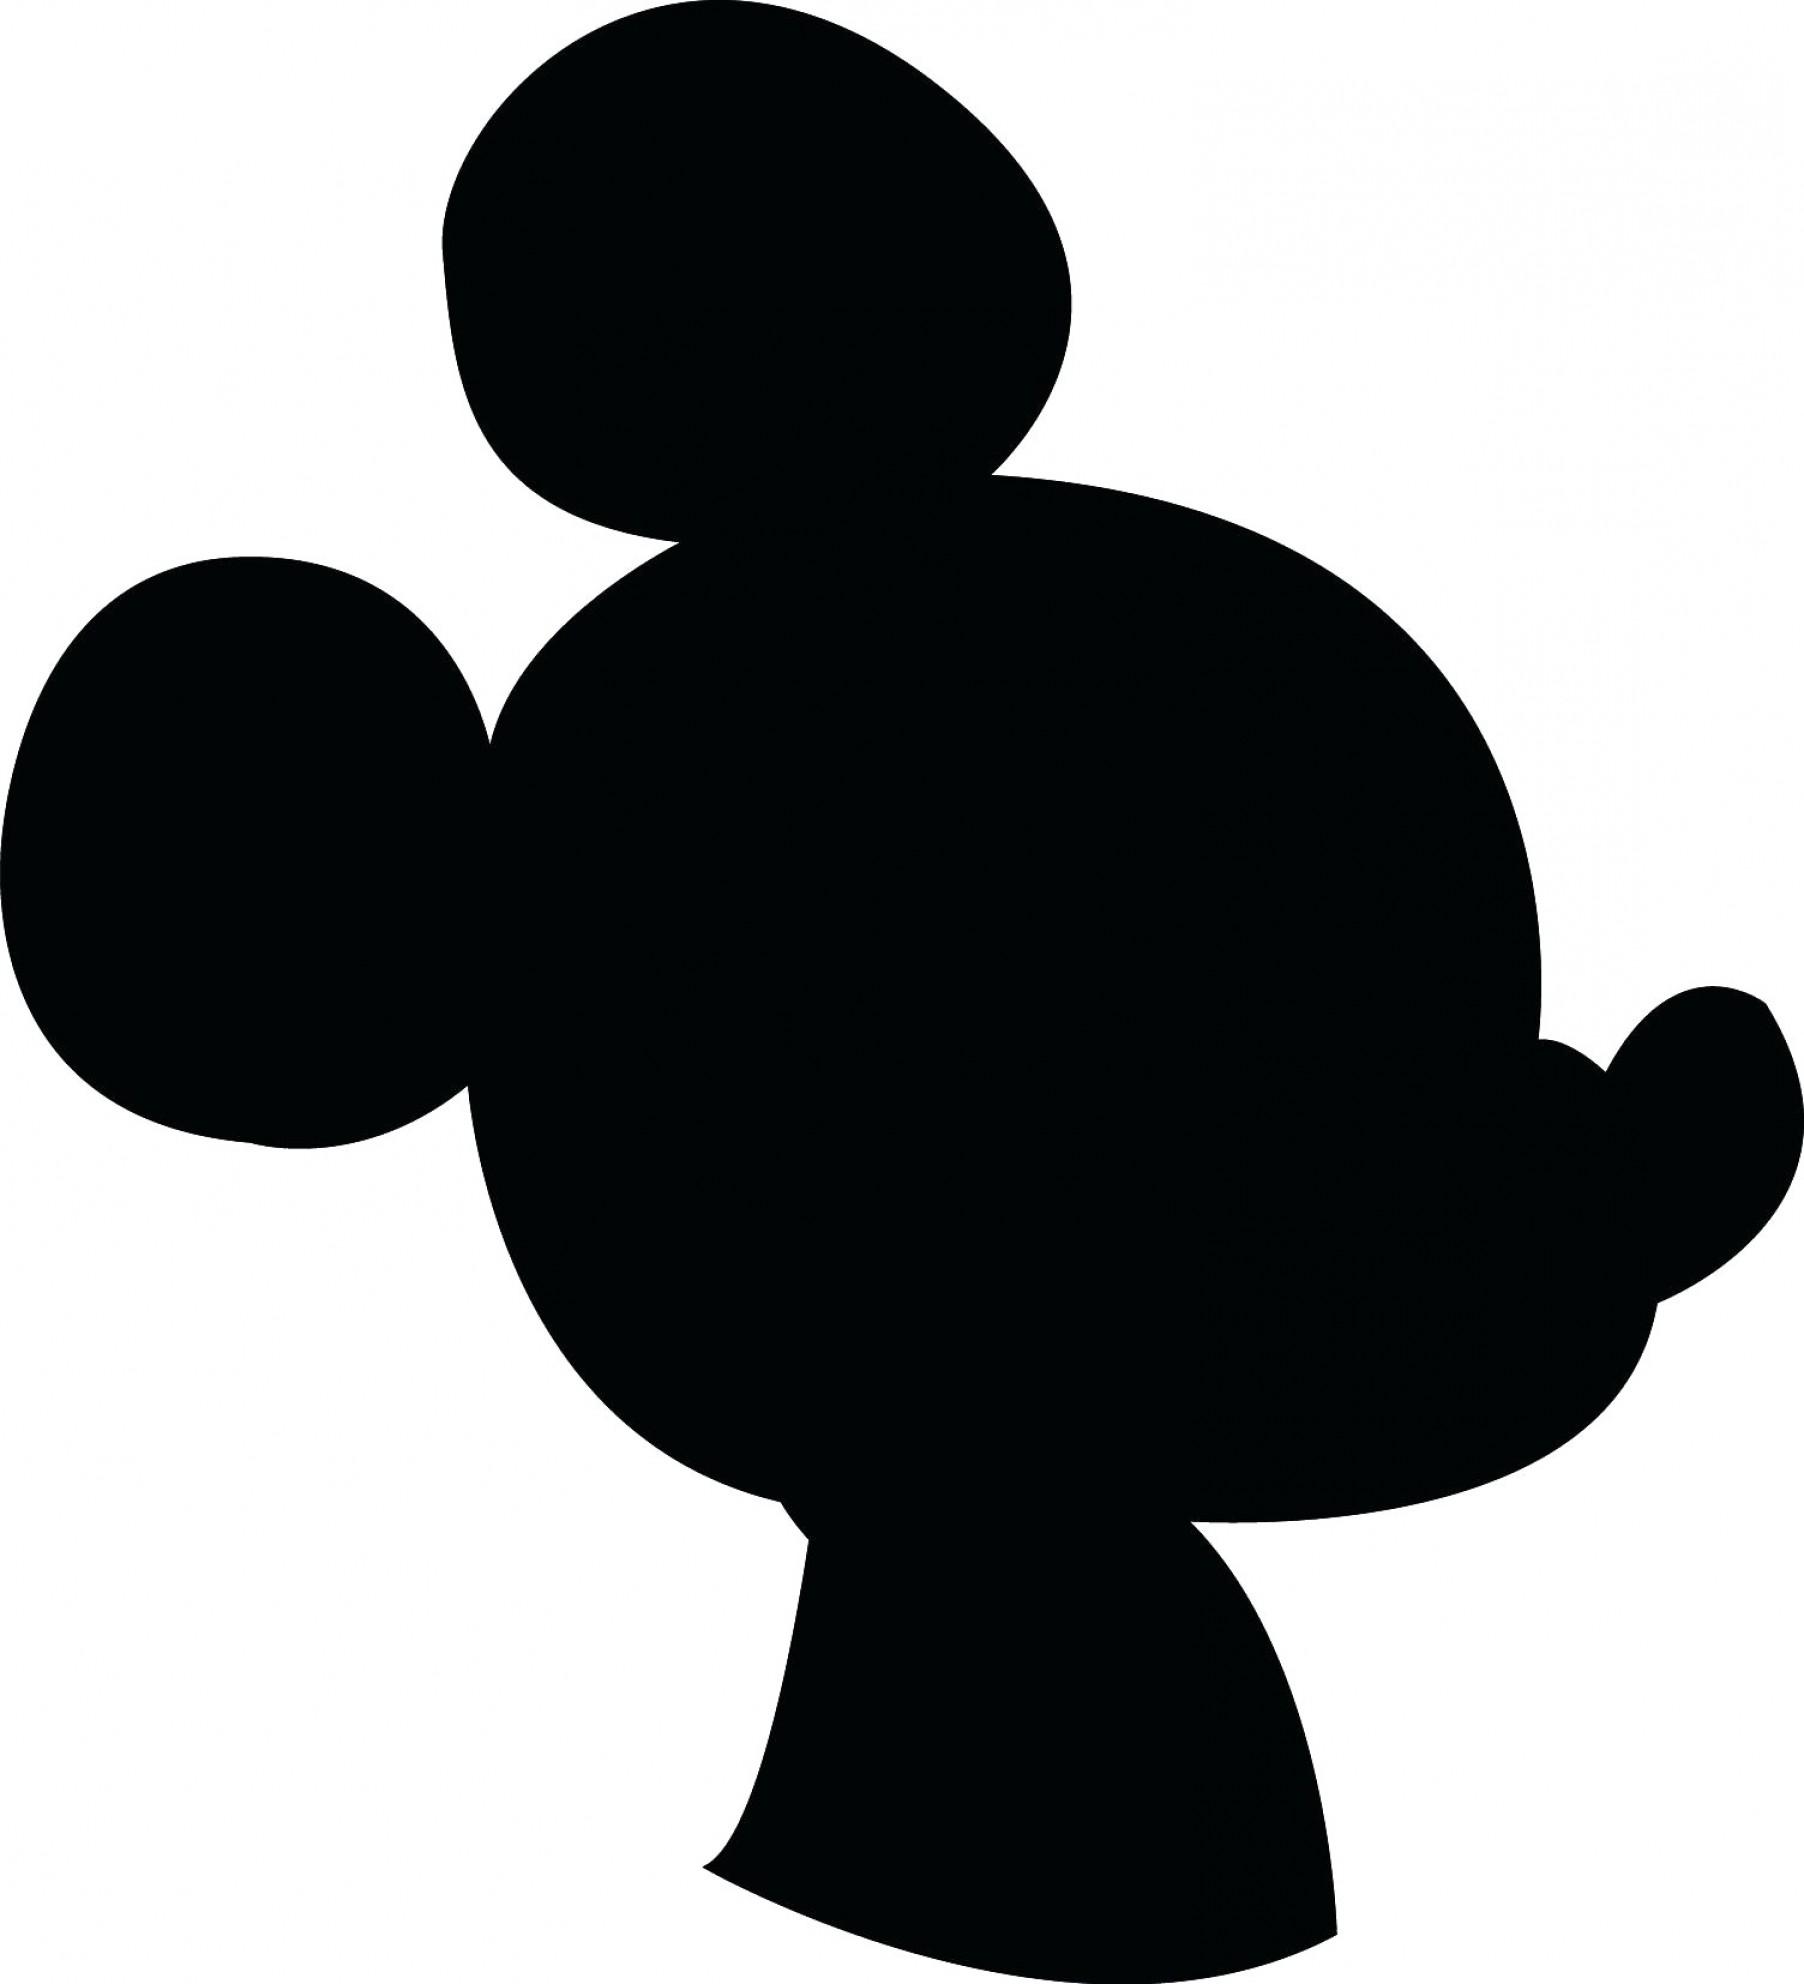 Silhouette Mickey Mouse Ears Head.